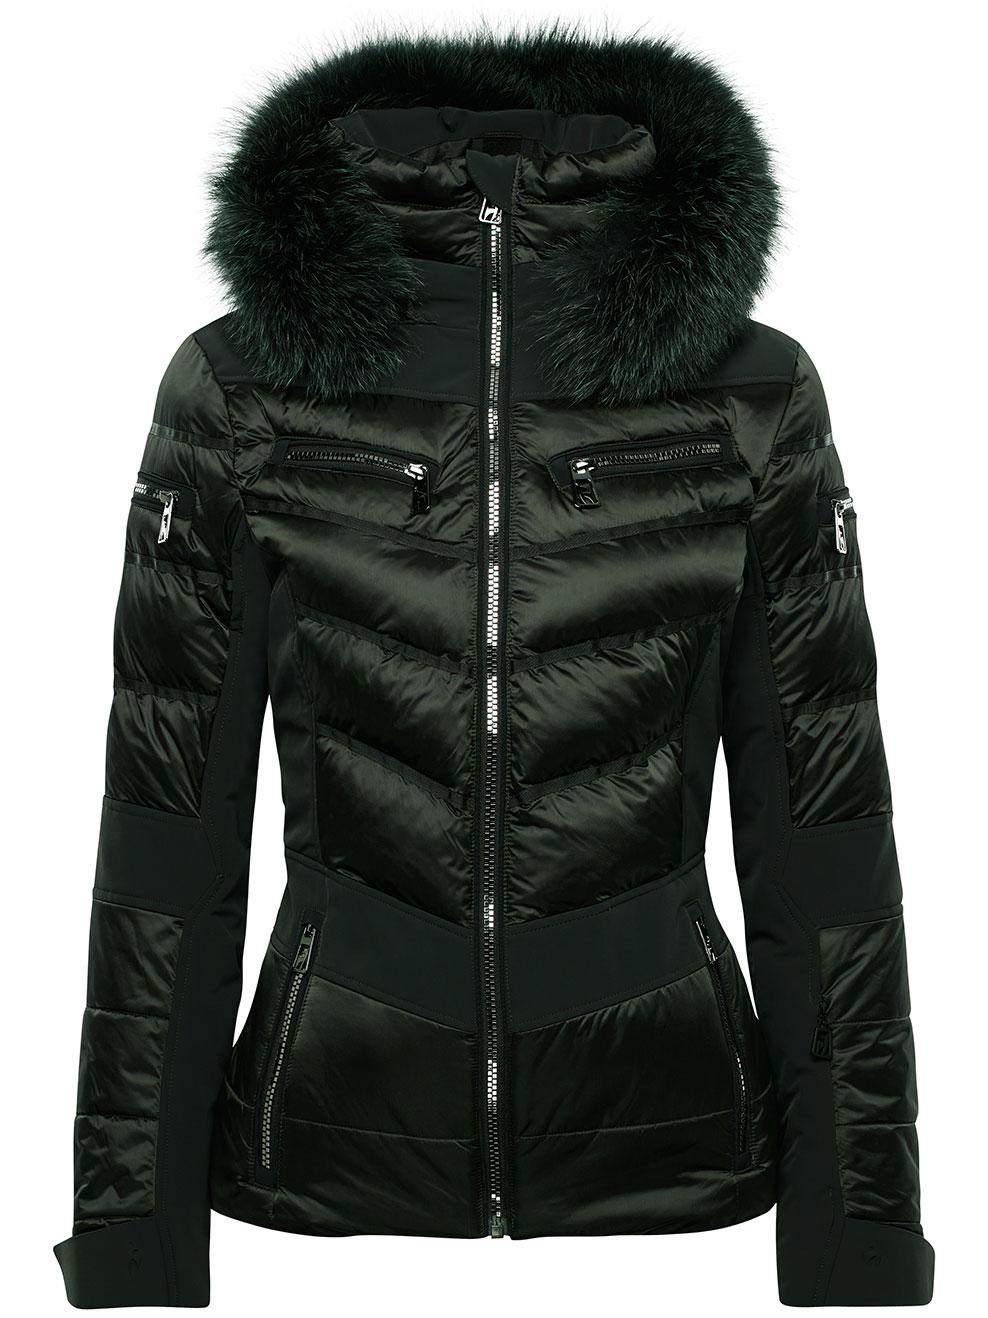 3841a64cf29b Toni Sailer Maria Fur - Ski Jackets - buy online at Sport Gardena